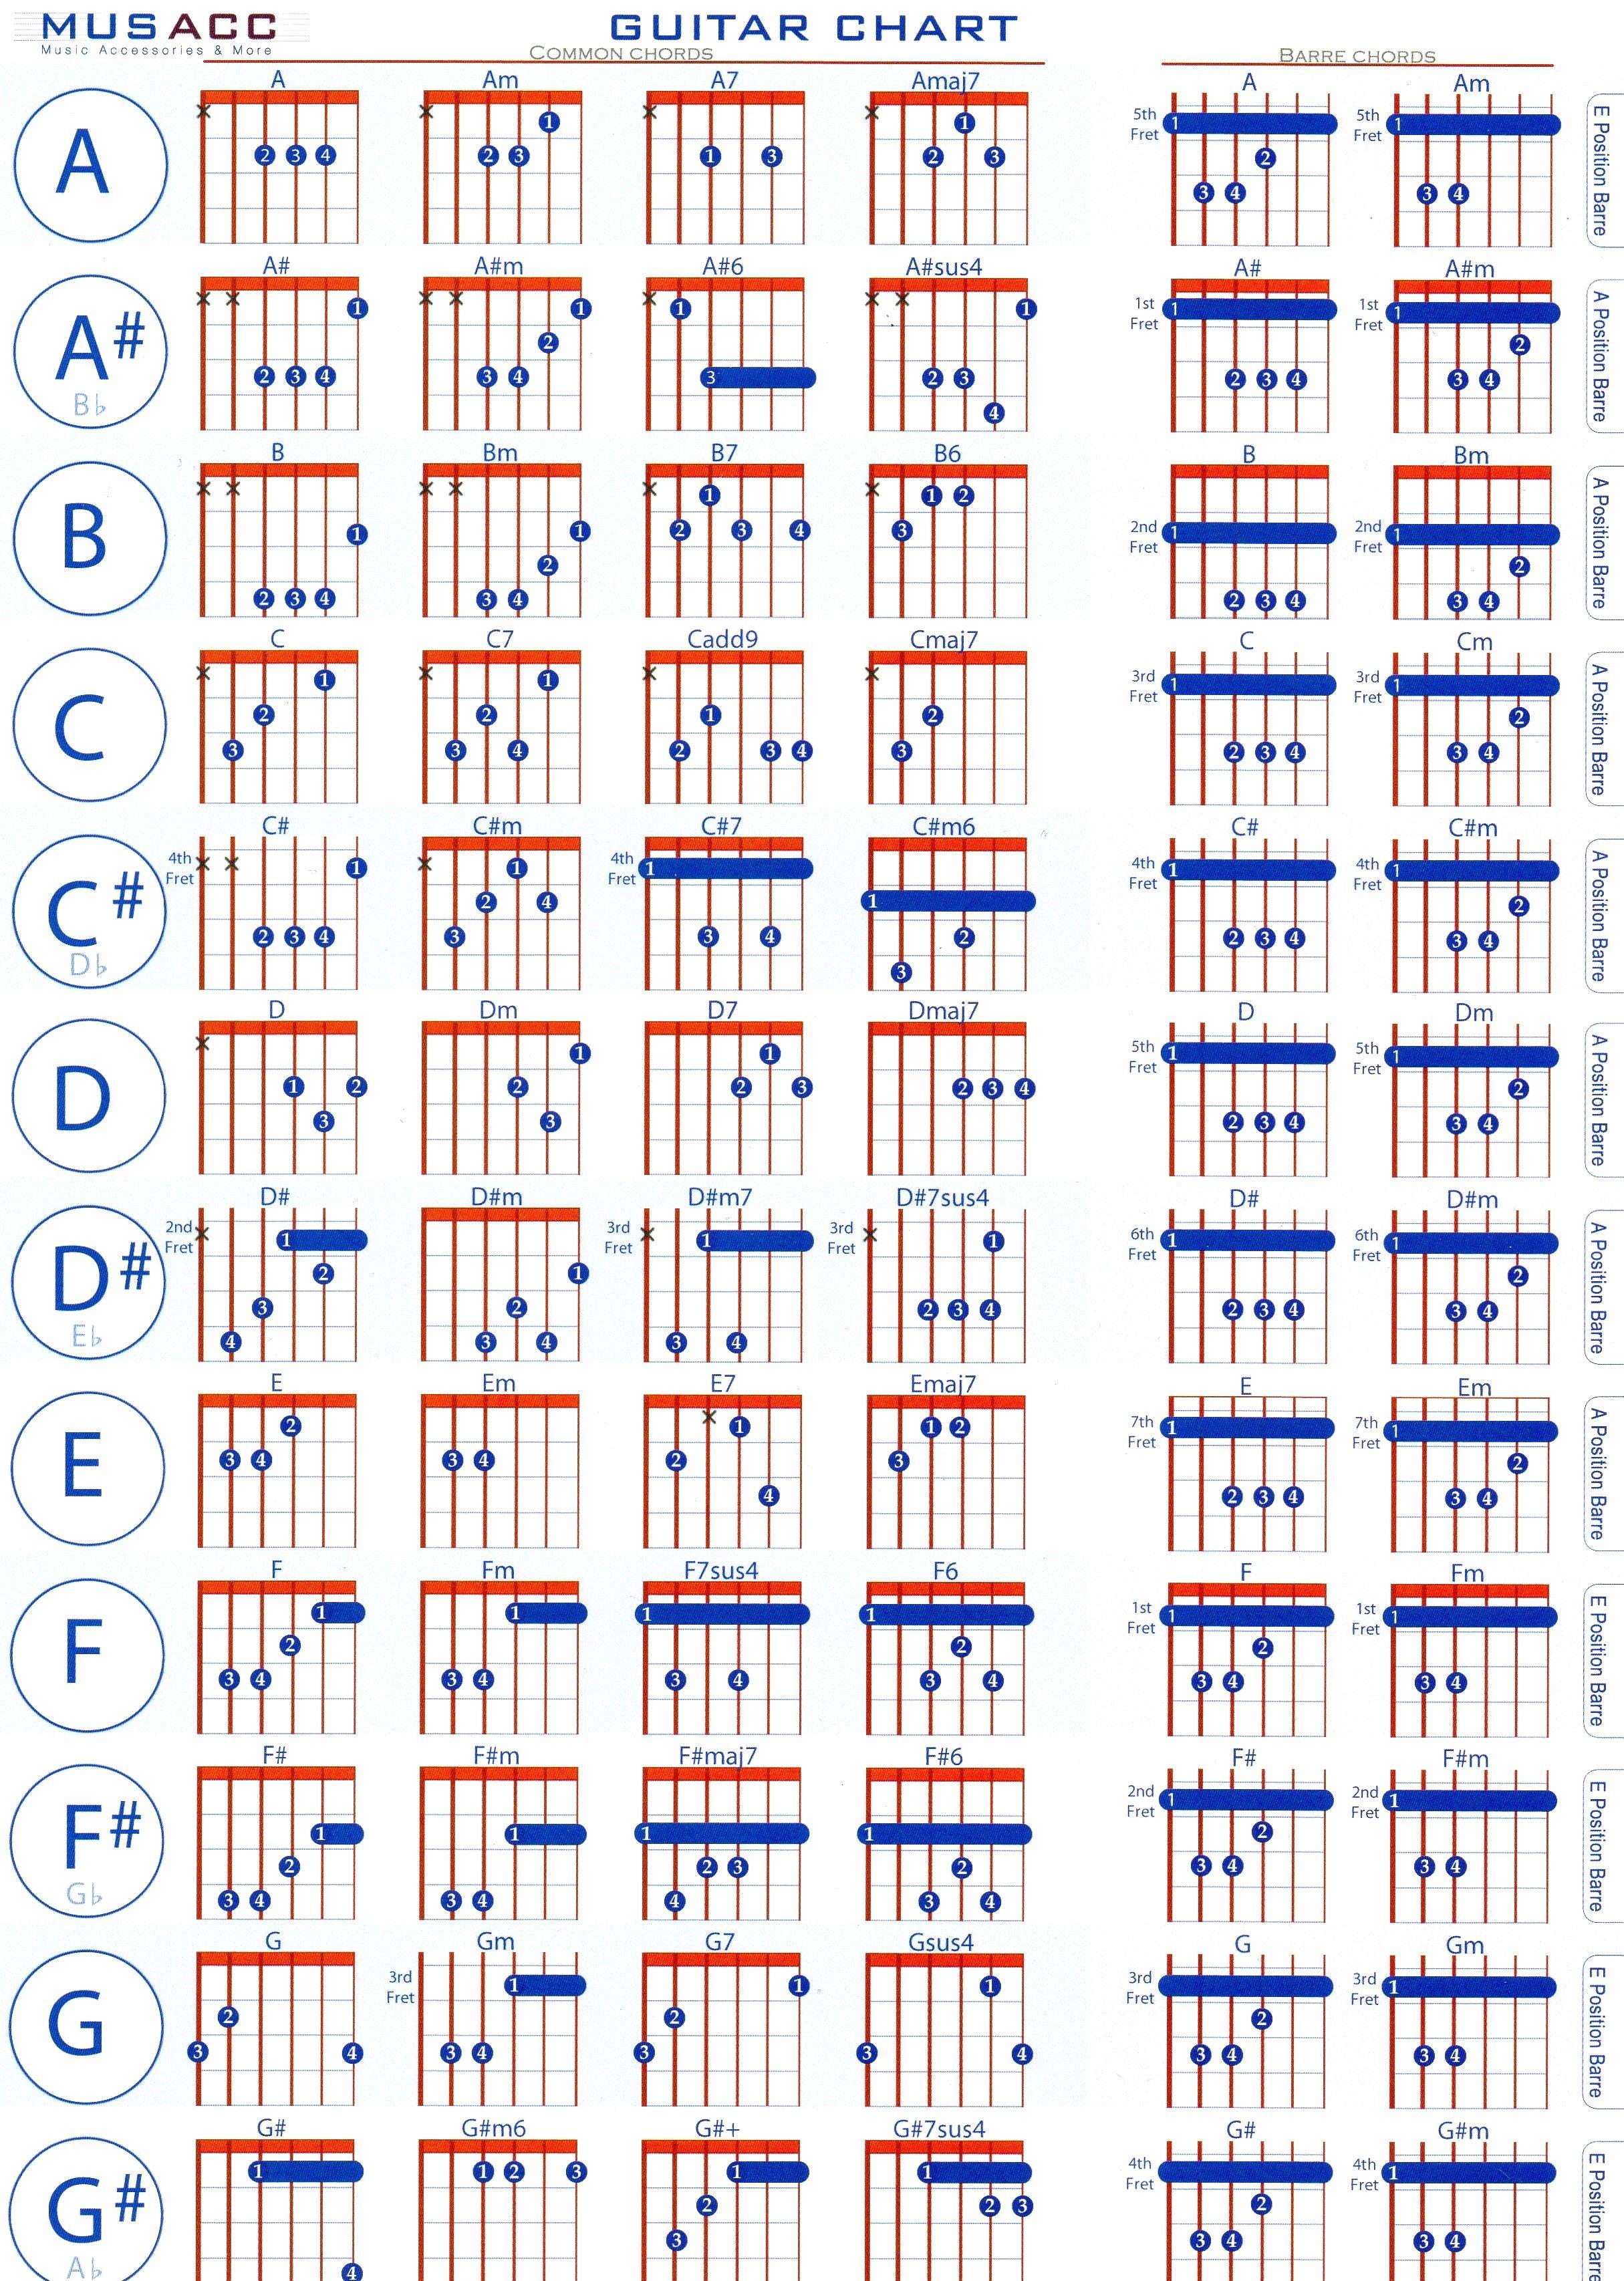 Left Hand Guitar Chords Chart Printable Classical Guitar Chords Chart Pdf Jazz Chord Progressions Pdf Free Guitar Chord Chart Piano Chords Chart Guitar Chords